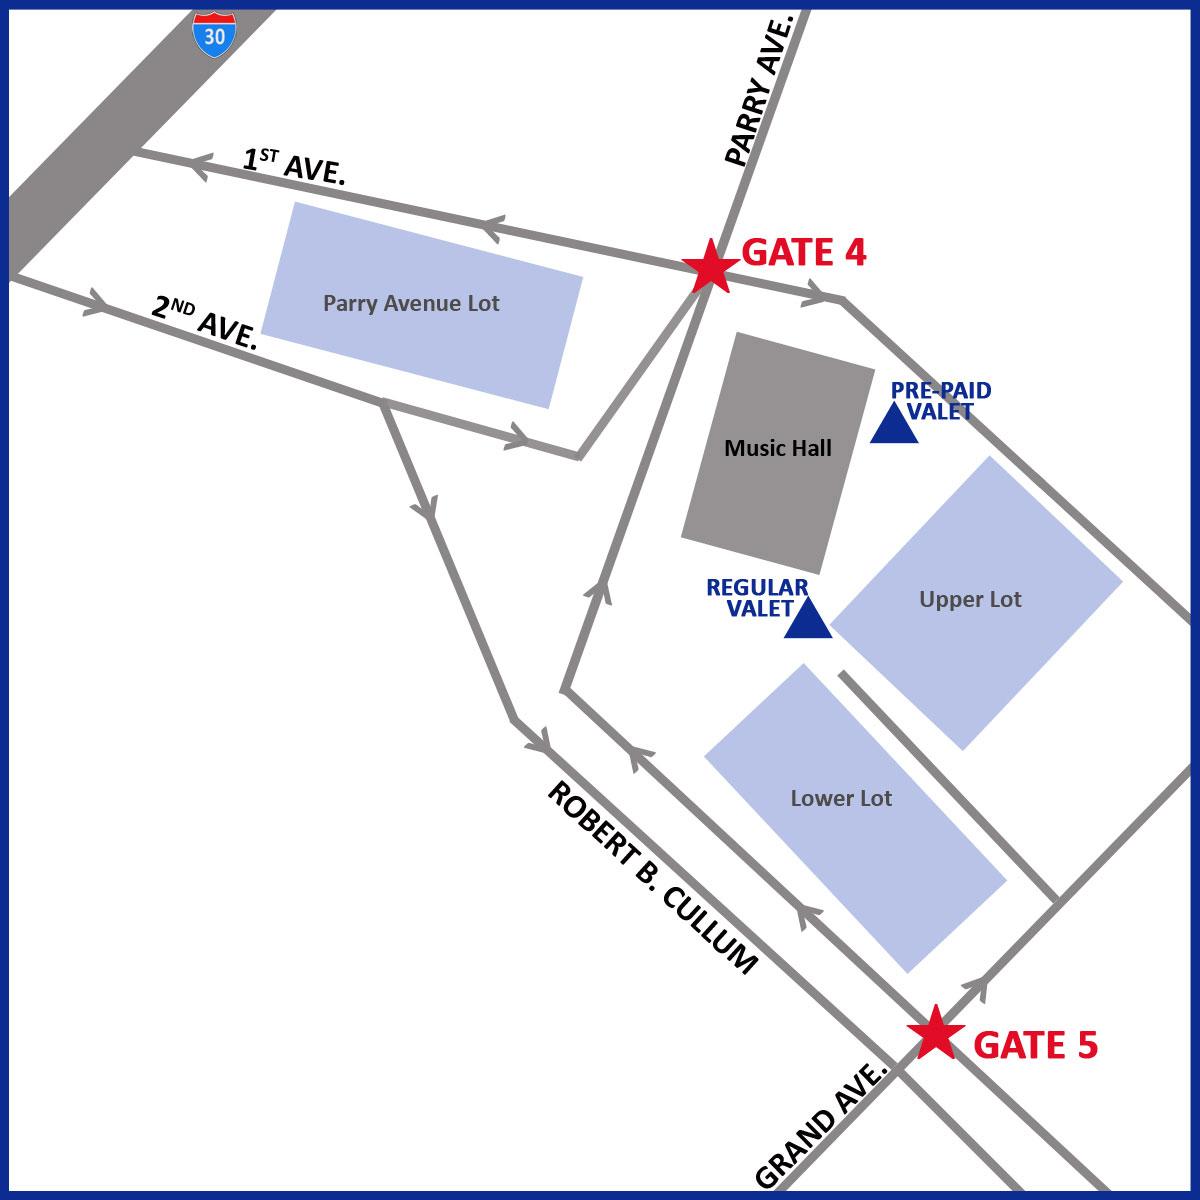 DSM Parking Map